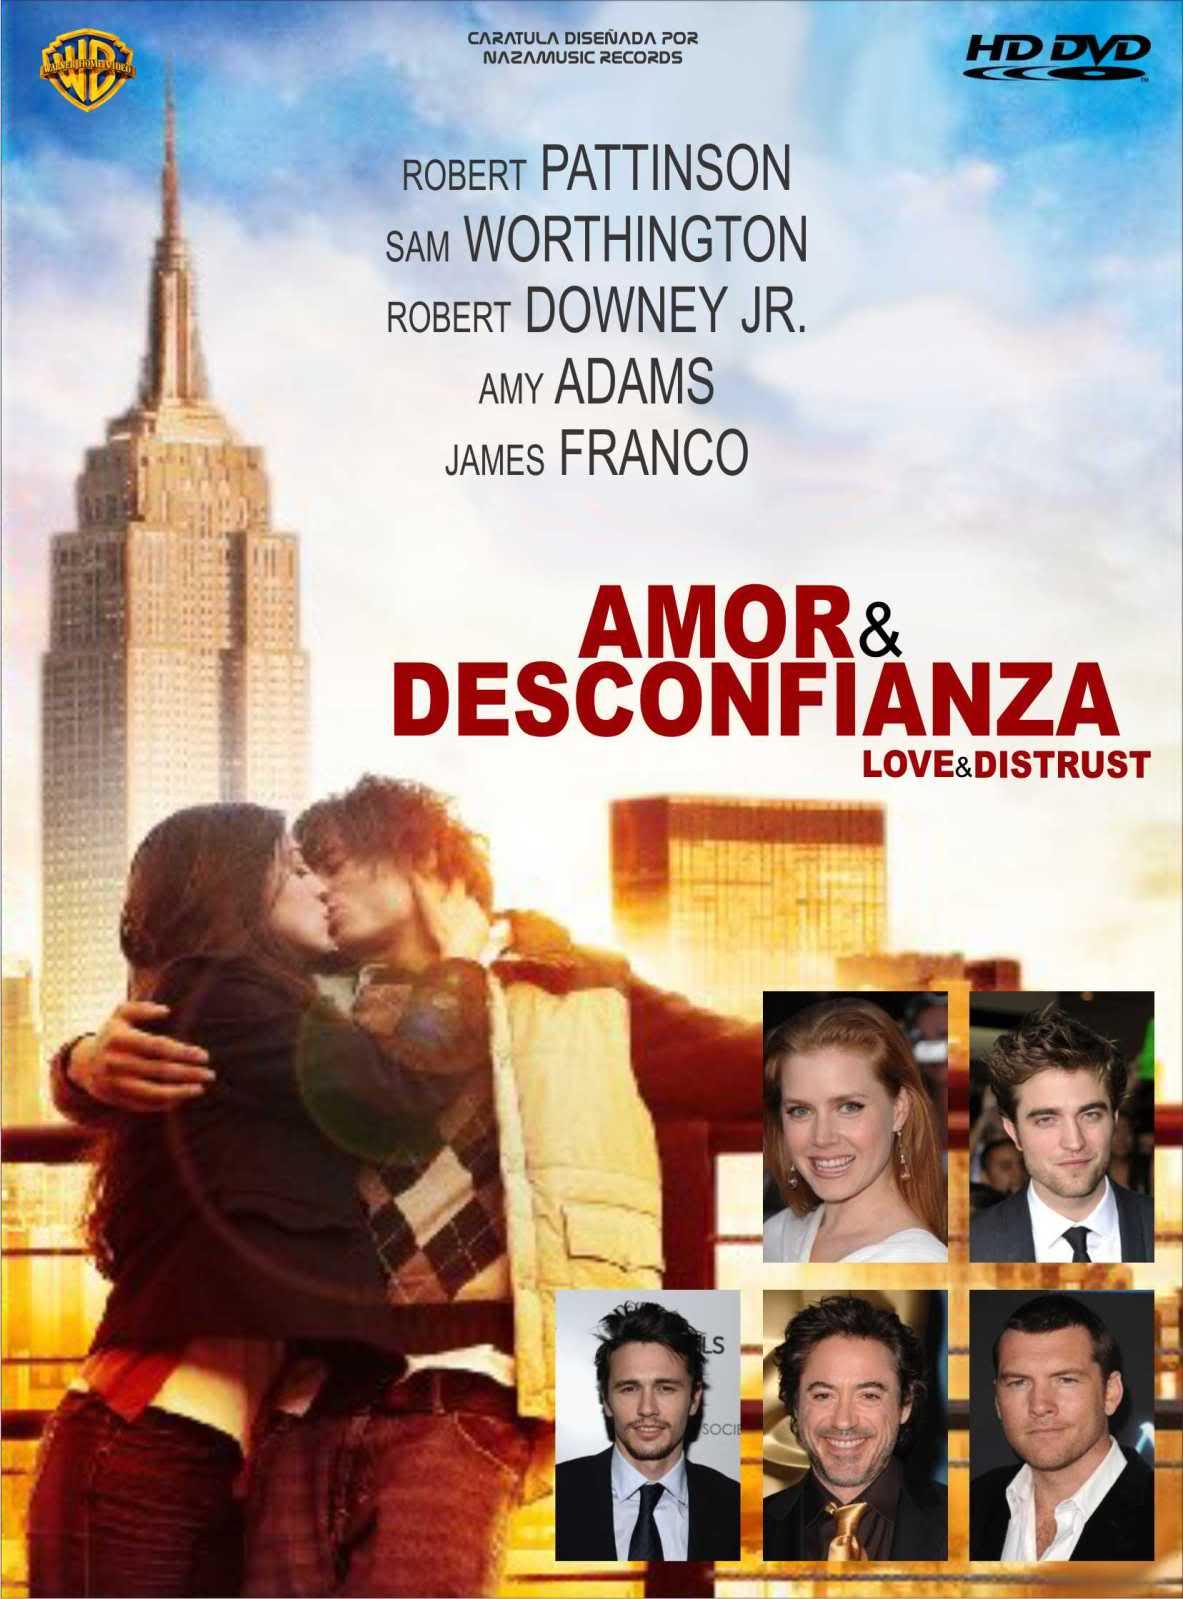 http://3.bp.blogspot.com/-A3fC6gw-cBo/T-kHlSAulcI/AAAAAAAAAE4/FLT44qS4yNA/s1600/amor_y_desconfianza.jpg